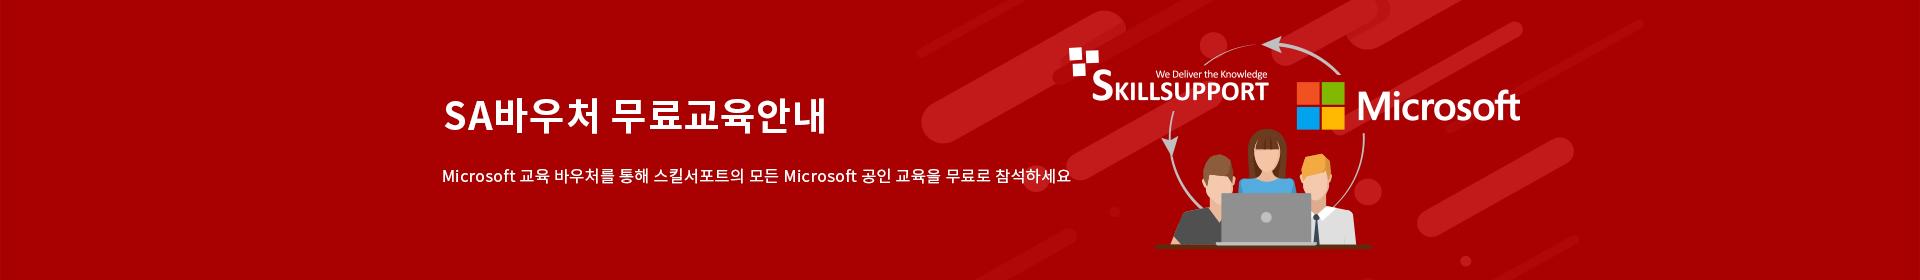 SA바우처 무료교육안내 : Microsoft 교육 바우처를 통해 스킬서포트의 모든 Microsoft 공인 교육을 무료로 참석하세요